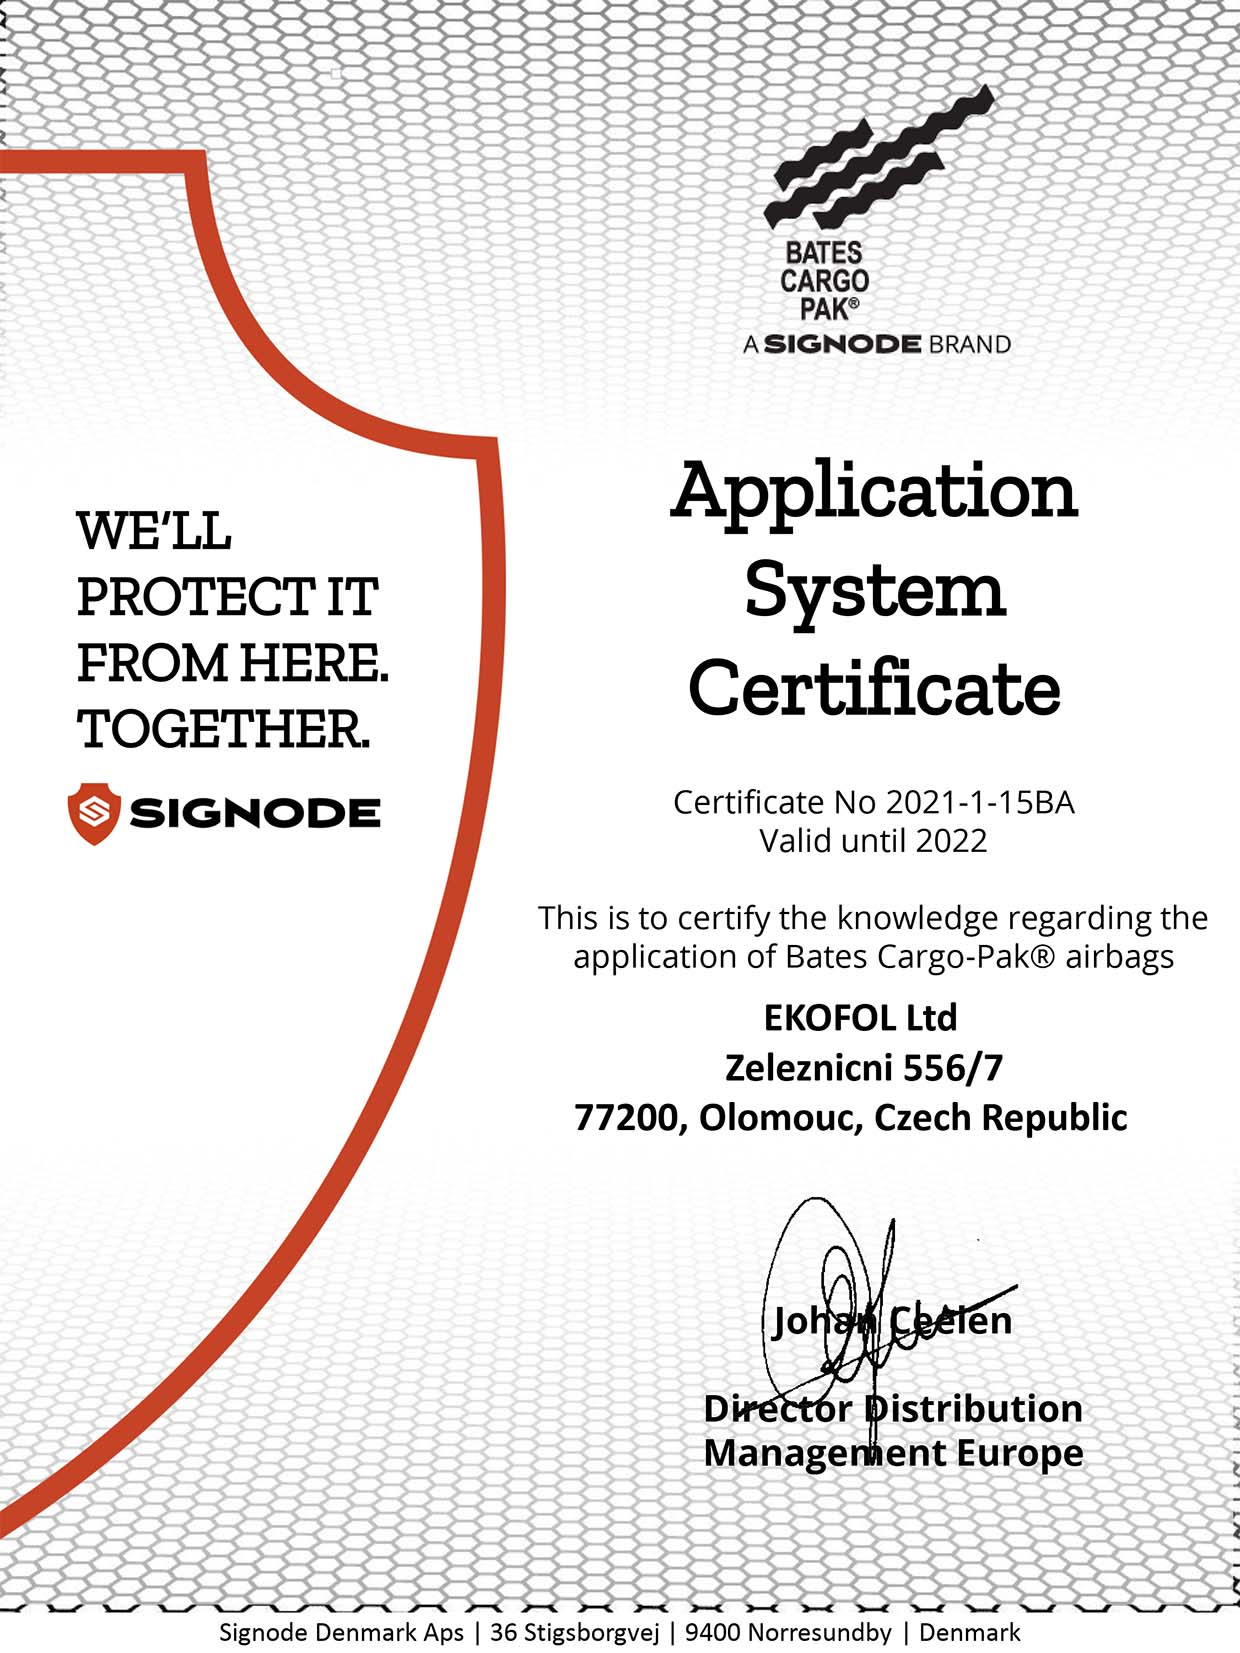 Bates Cargo Pak certificate 2021